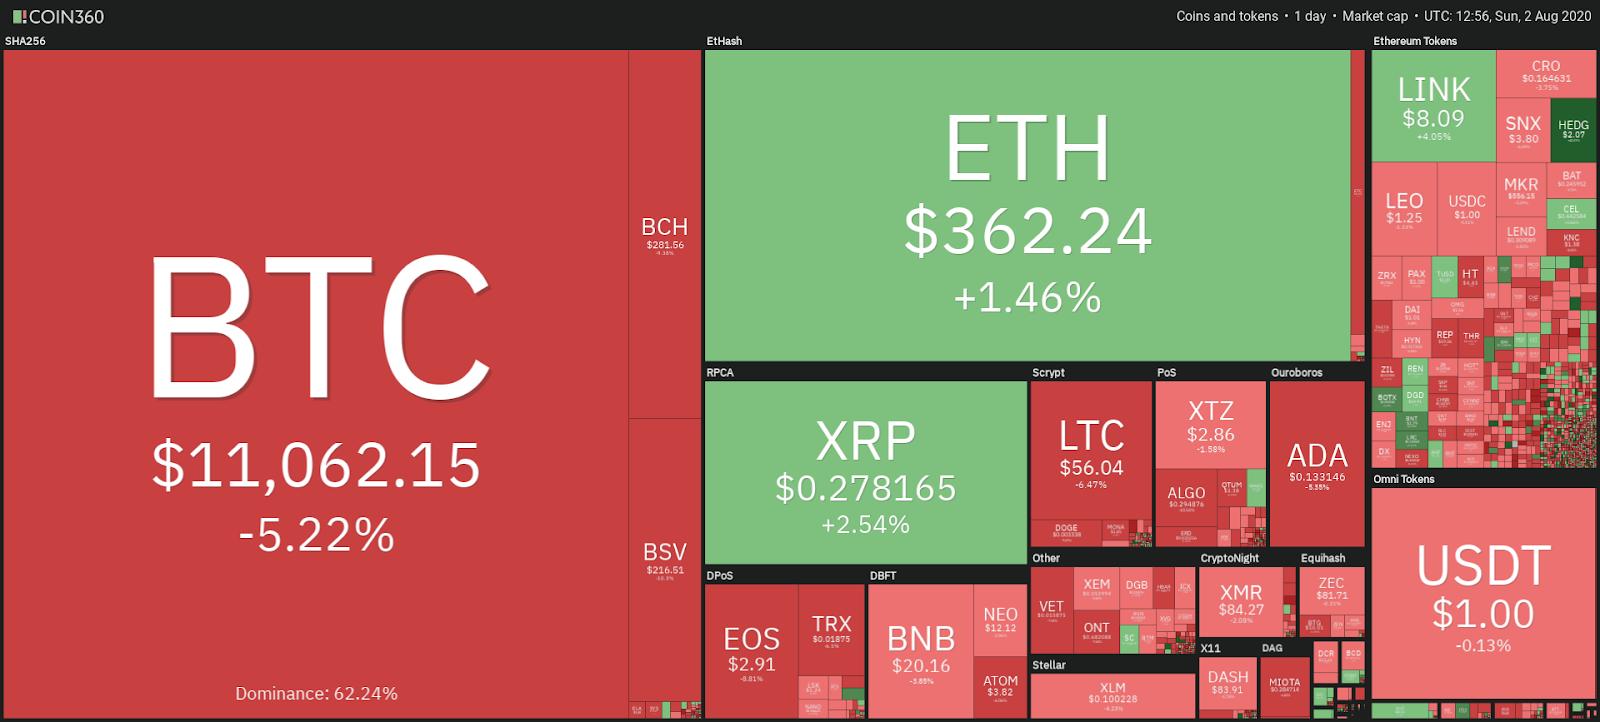 Snapshot pasar cryptocurrency harian, 2 Agustus